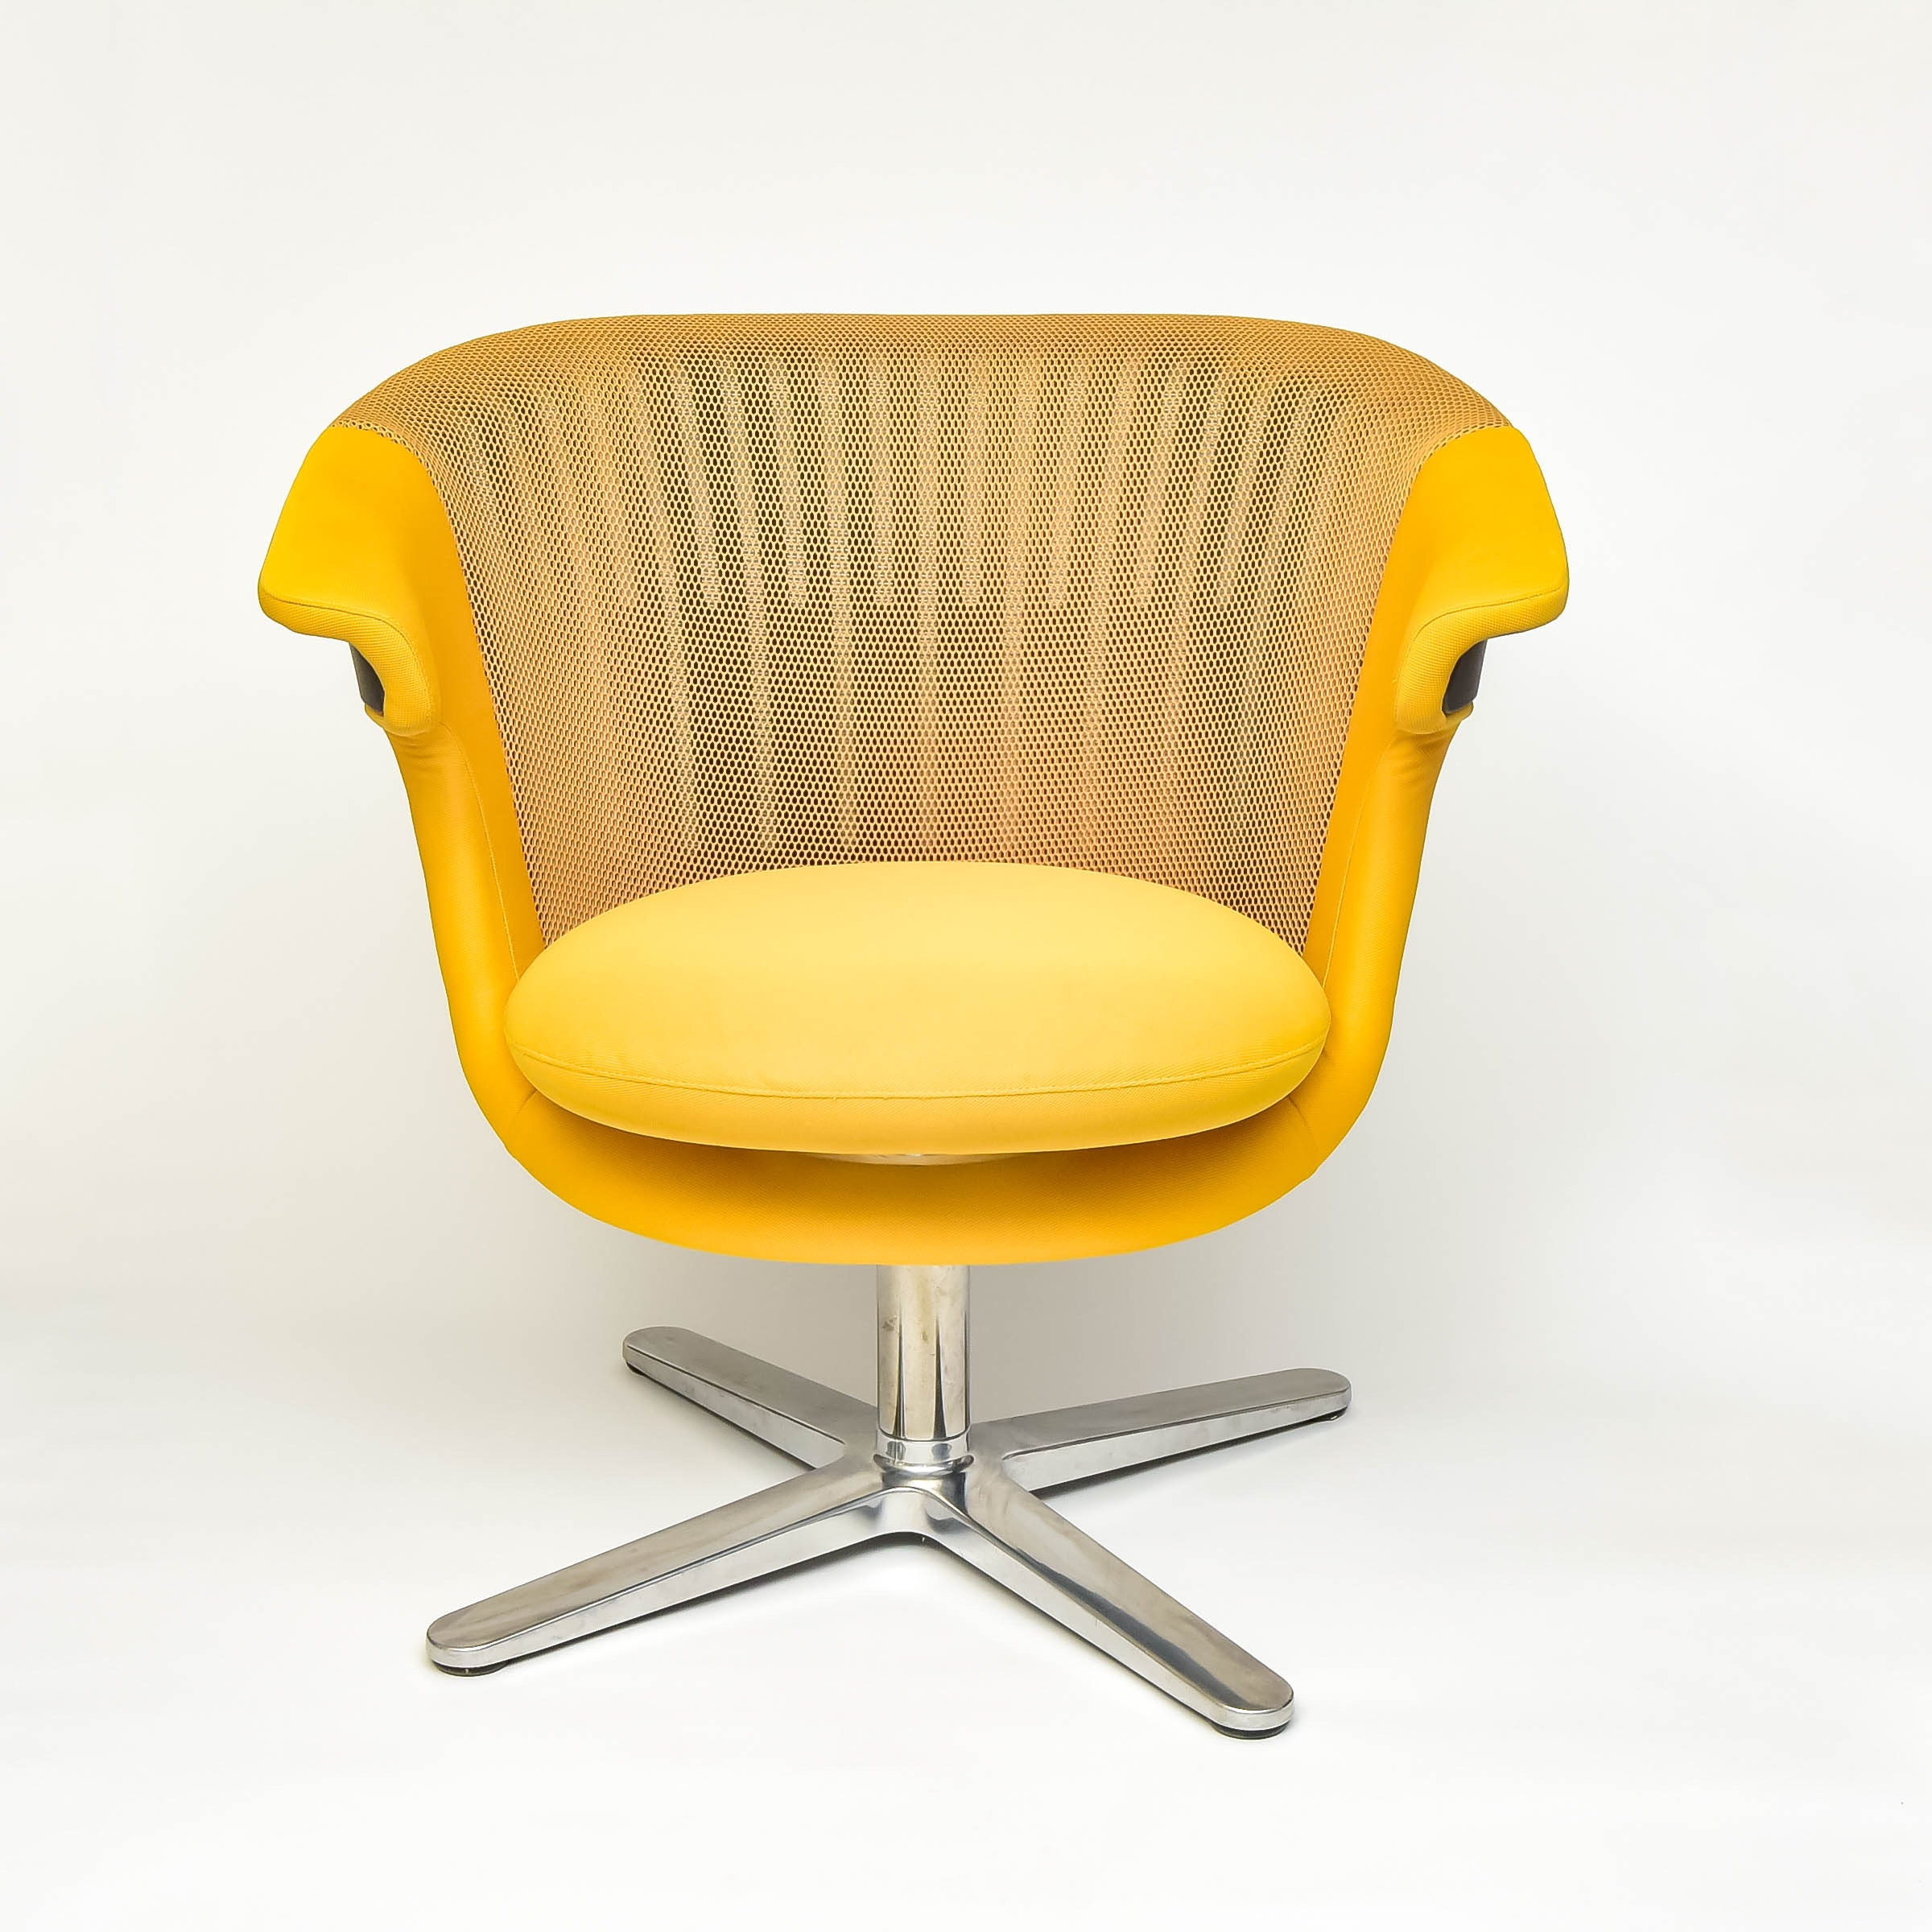 Canary Yellow Steelcase i2i Ergonomic Chair